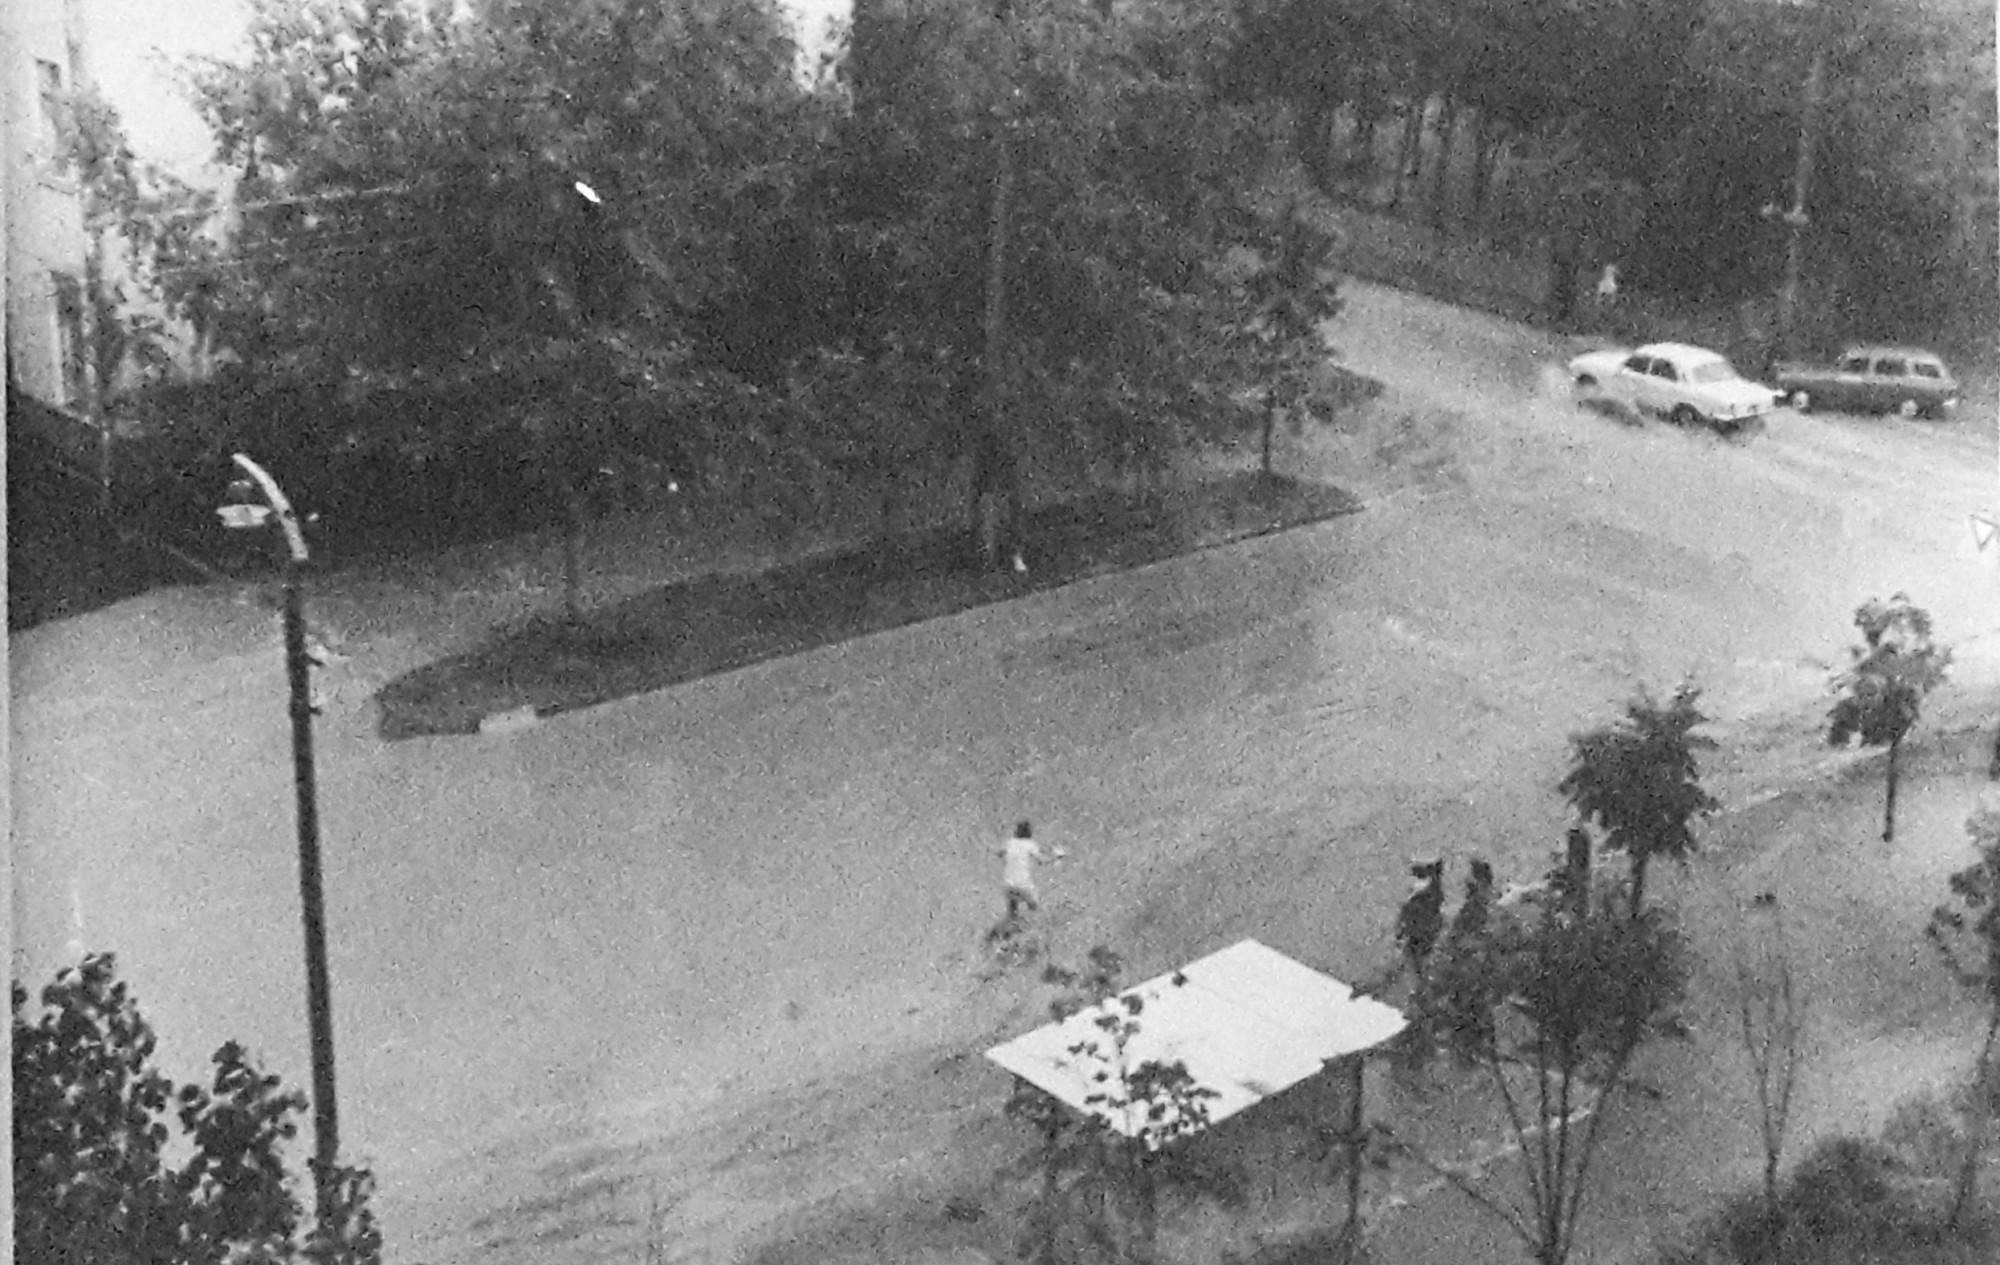 1970е вид из окна дома 21 ул. Б. Очаковская. Анна2